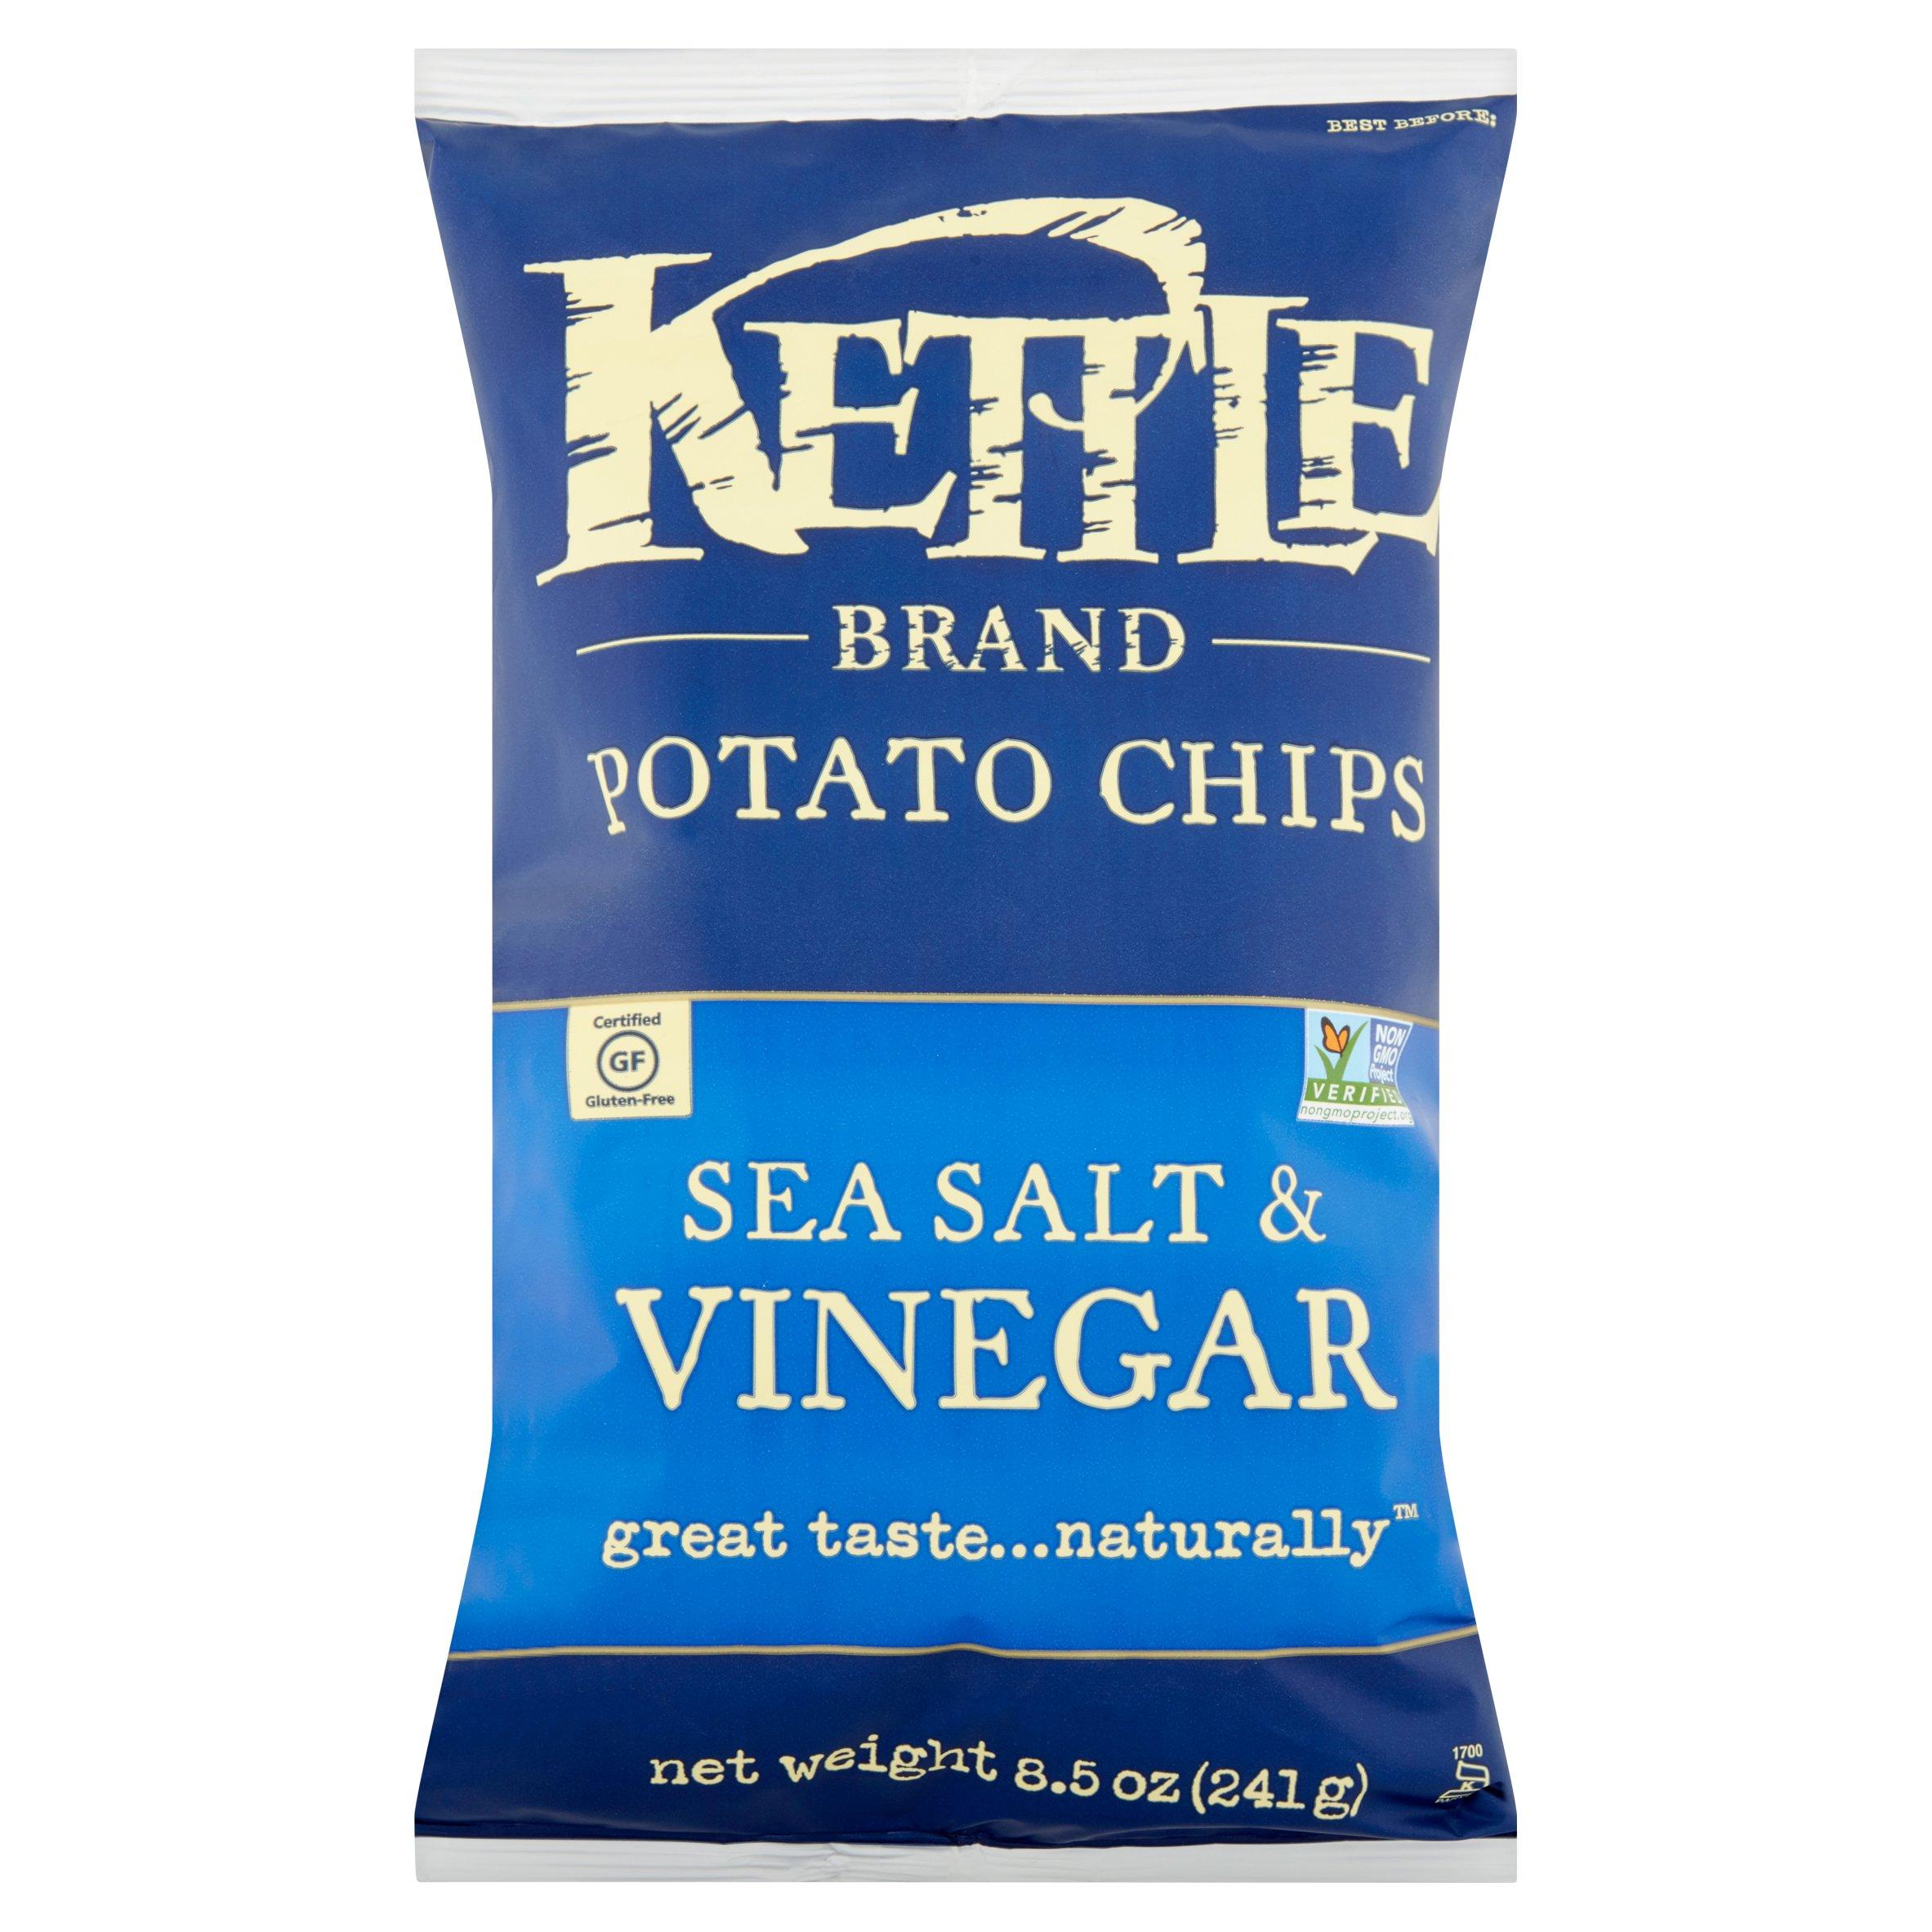 Kettle Brand Chips Sea Salt & Vinegar Potato Chips, 9 oz by Kettle Foods, Inc.